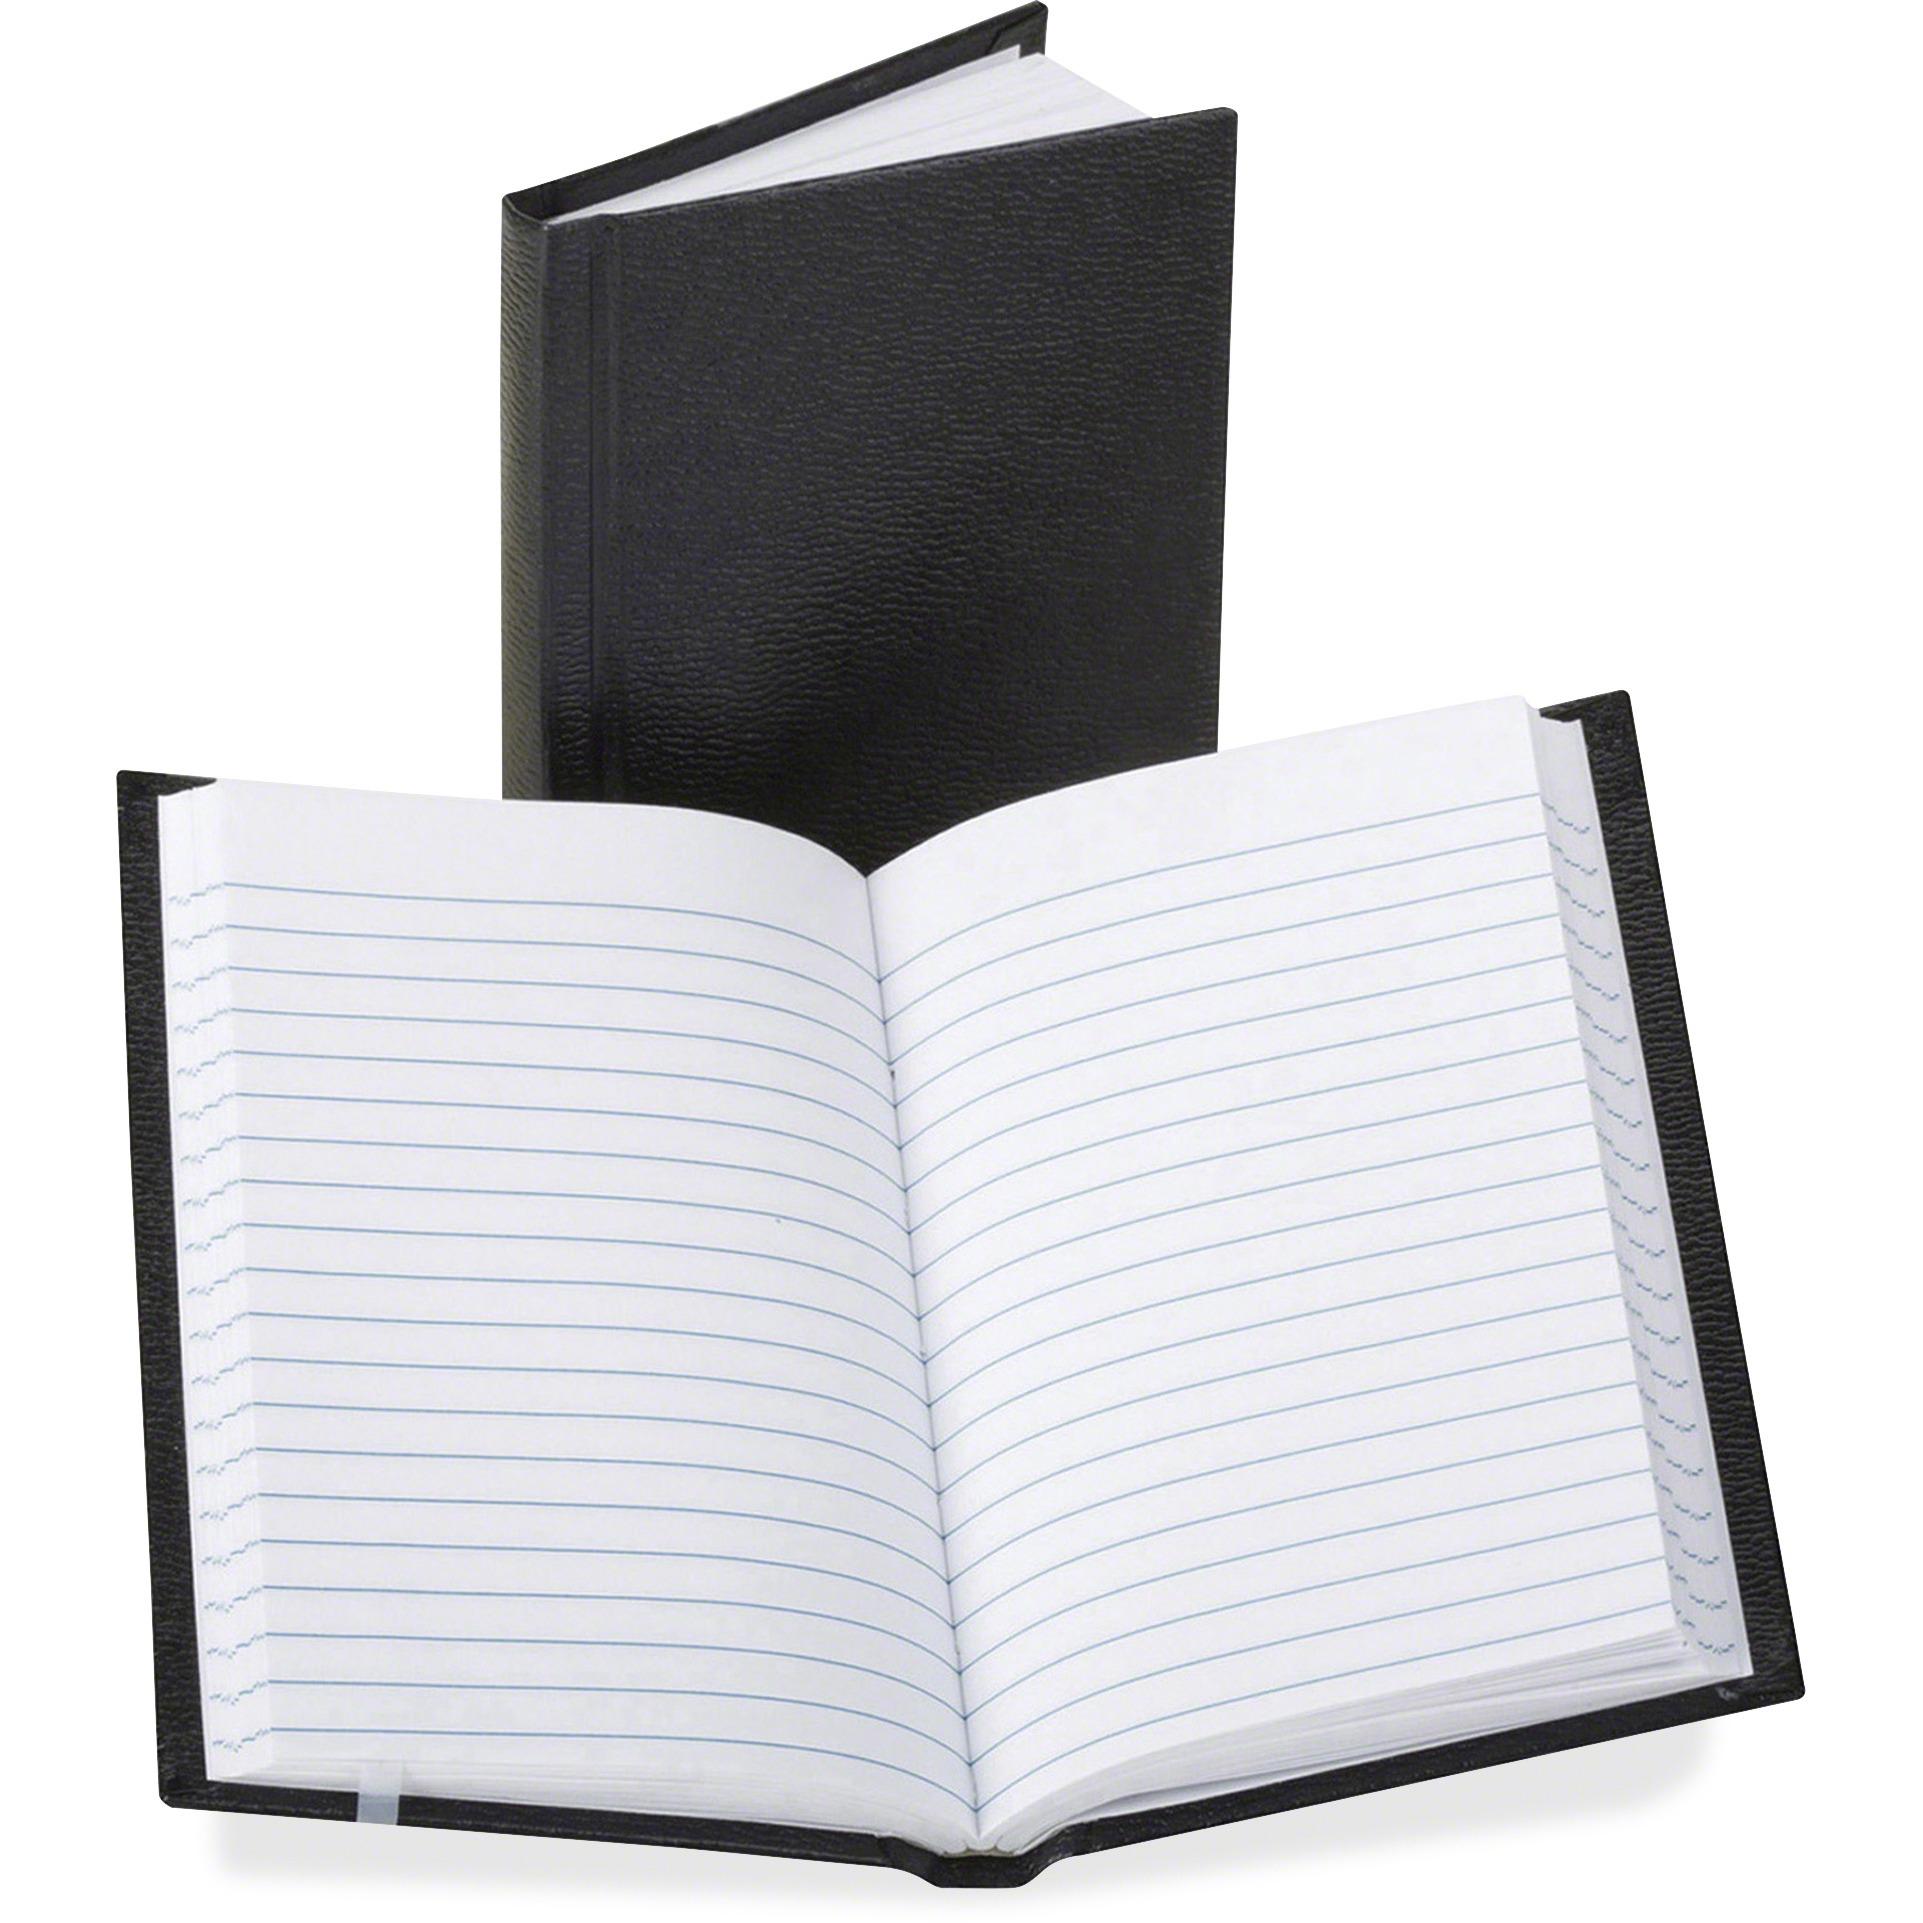 Boorum & Pease Pocket Size Bound Memo Book, 72-Page, Black